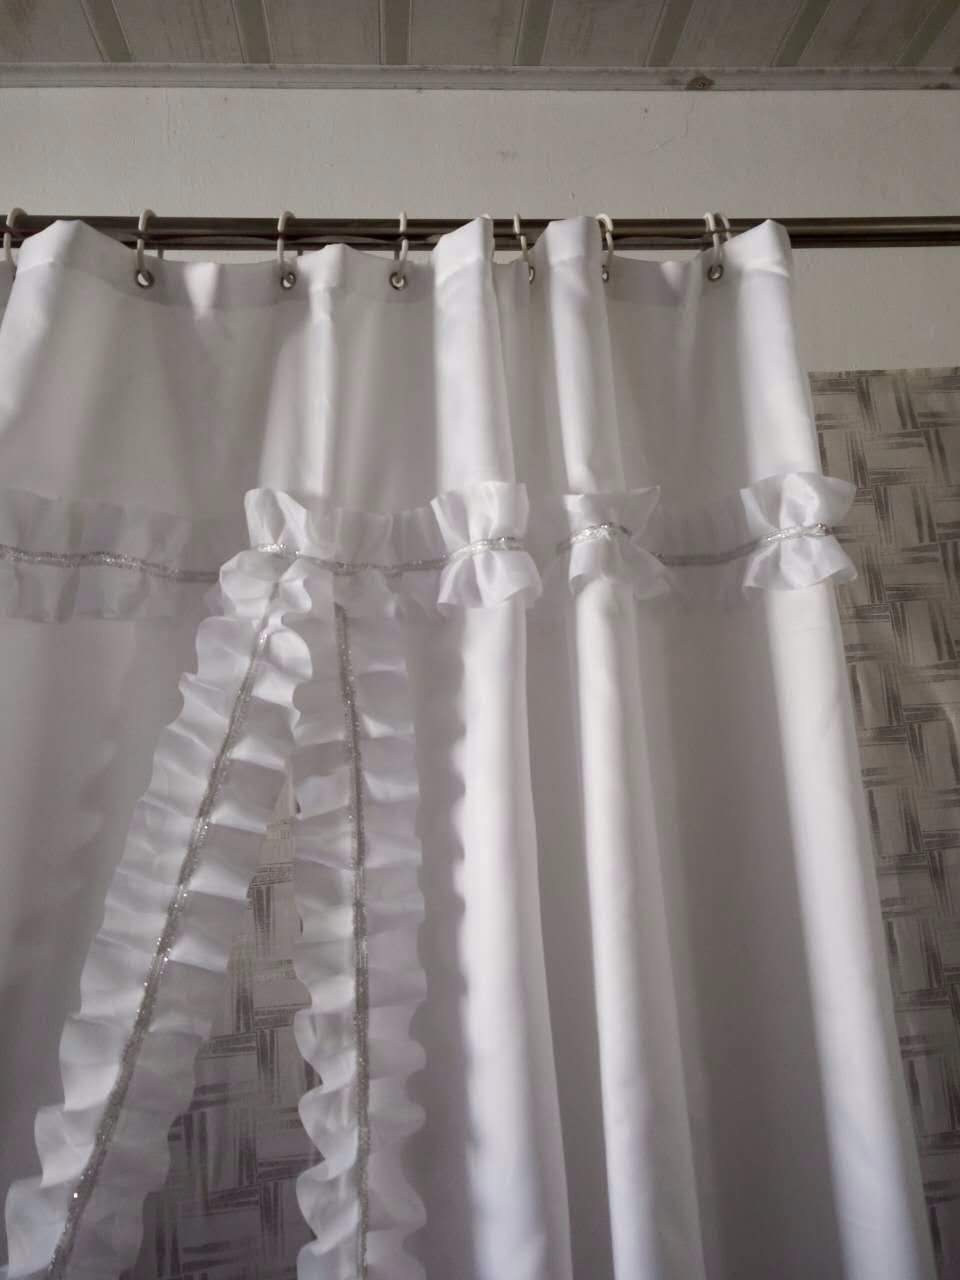 White ruffle shower curtain - 180 180cm Ruffles Shower Curtain Polyester Waterproof Bathroom Bath Curtain Screen Office Drape Partition Wall Purdah In Shower Curtains From Home Garden